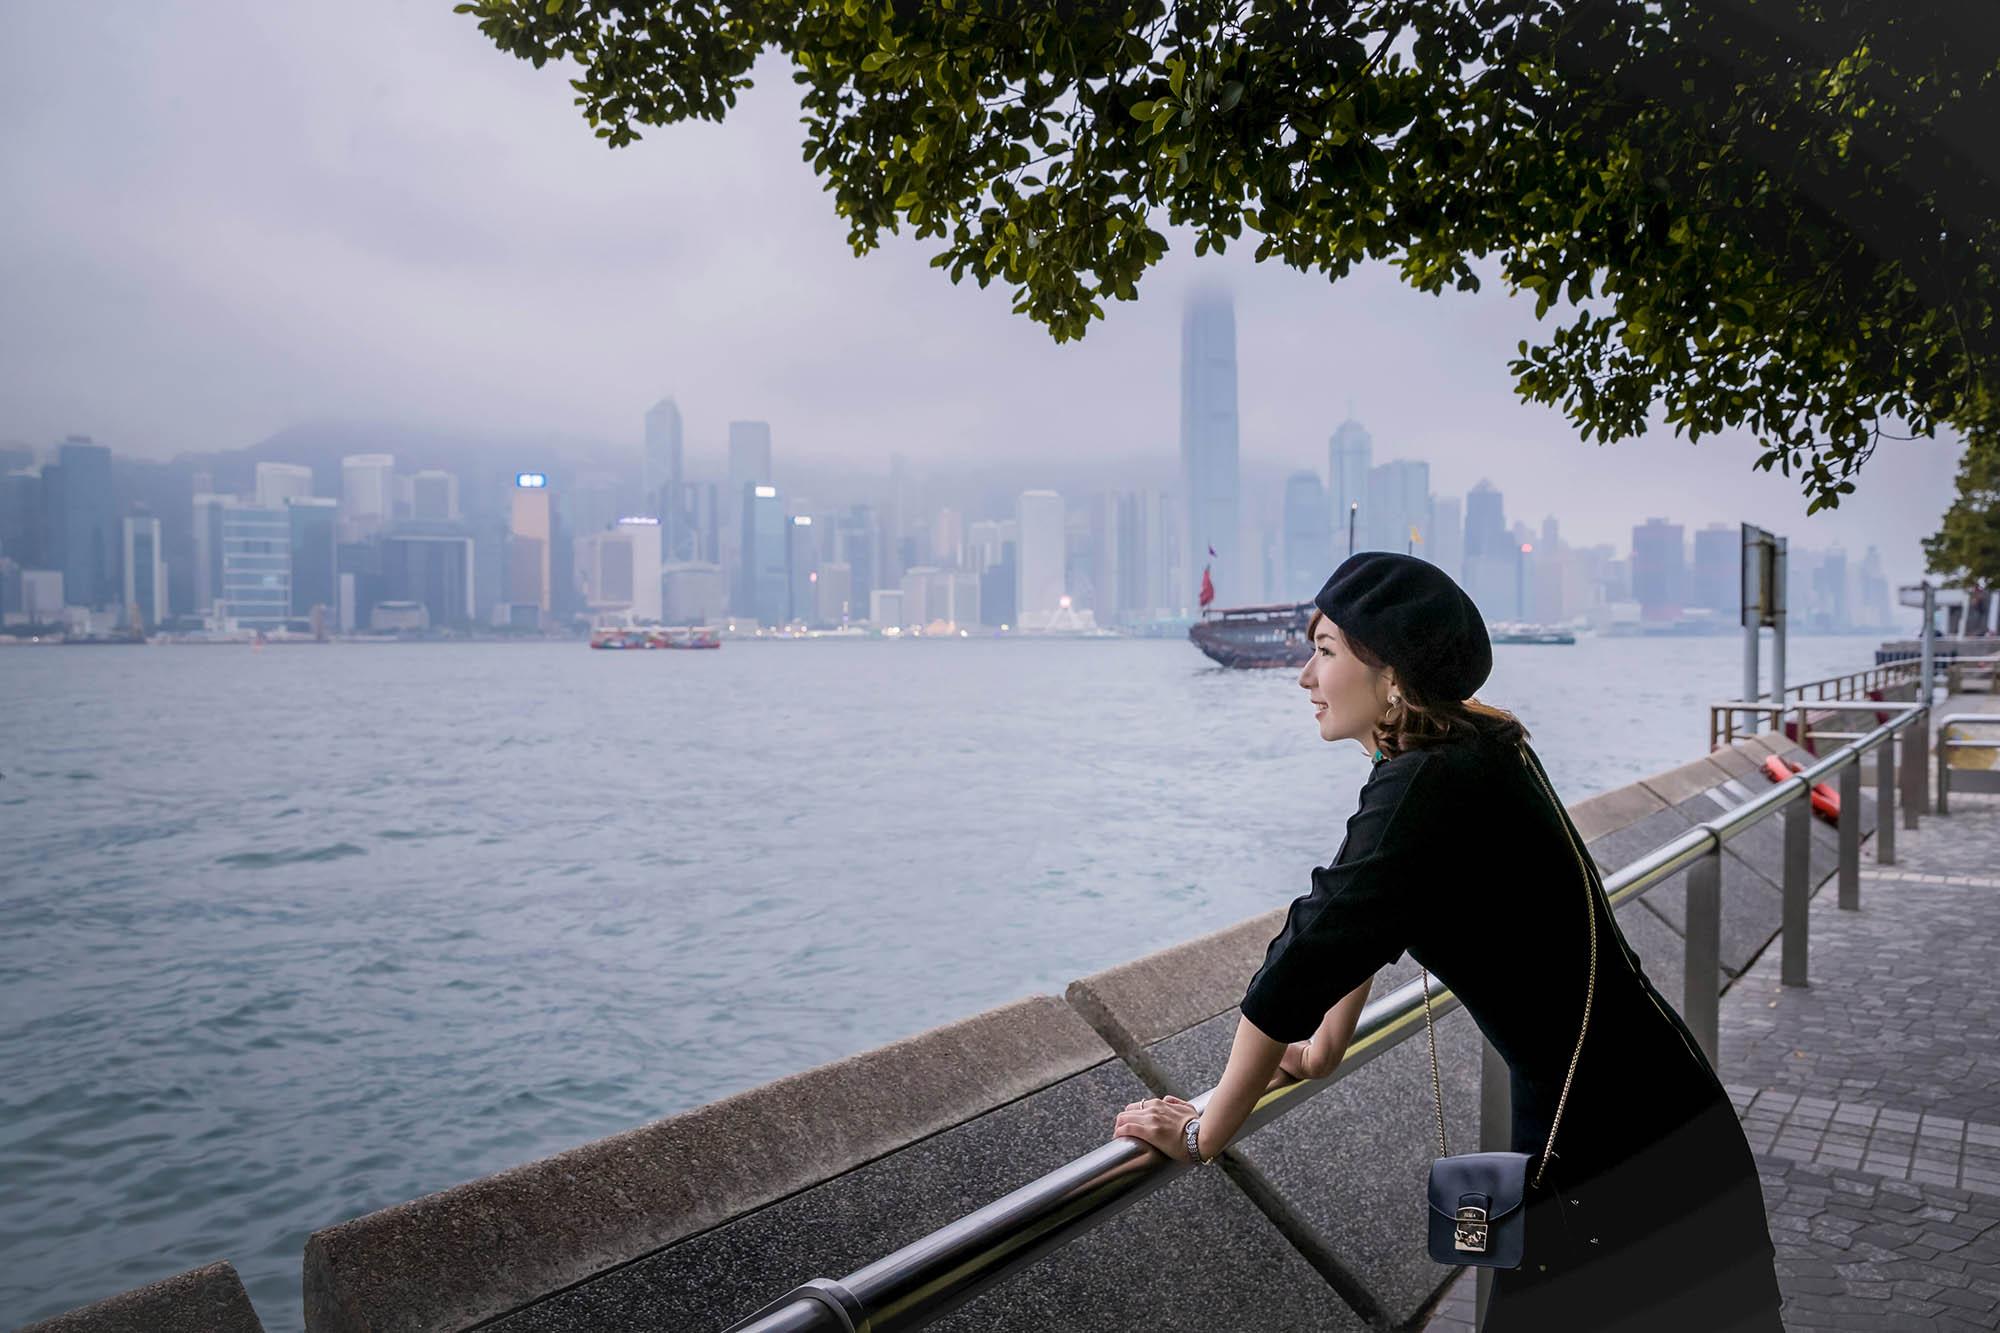 Sprazzi_Professional_Portrait_Photo_Hongkong_Kevin_Resize_11.jpg